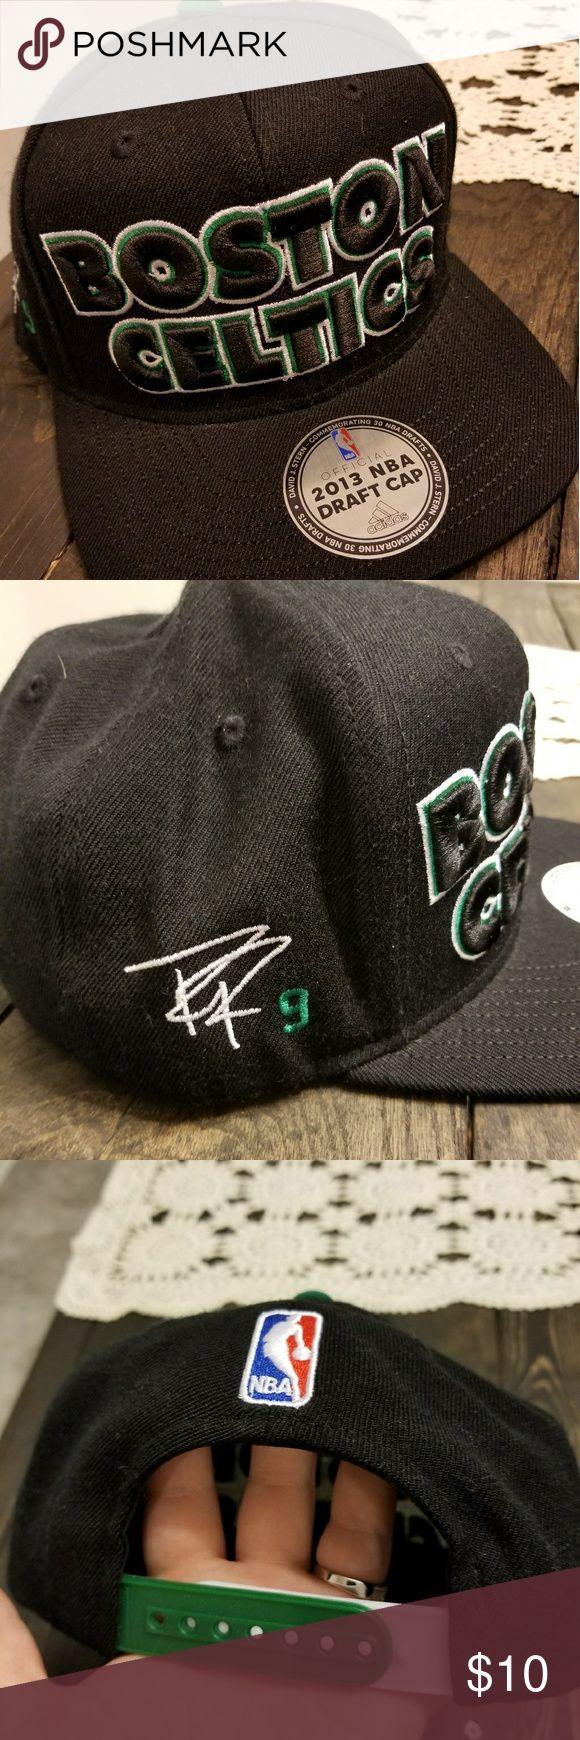 Adidas Boston Celtics Snapback 2013 NBA draft hat adidas Accessories Hats